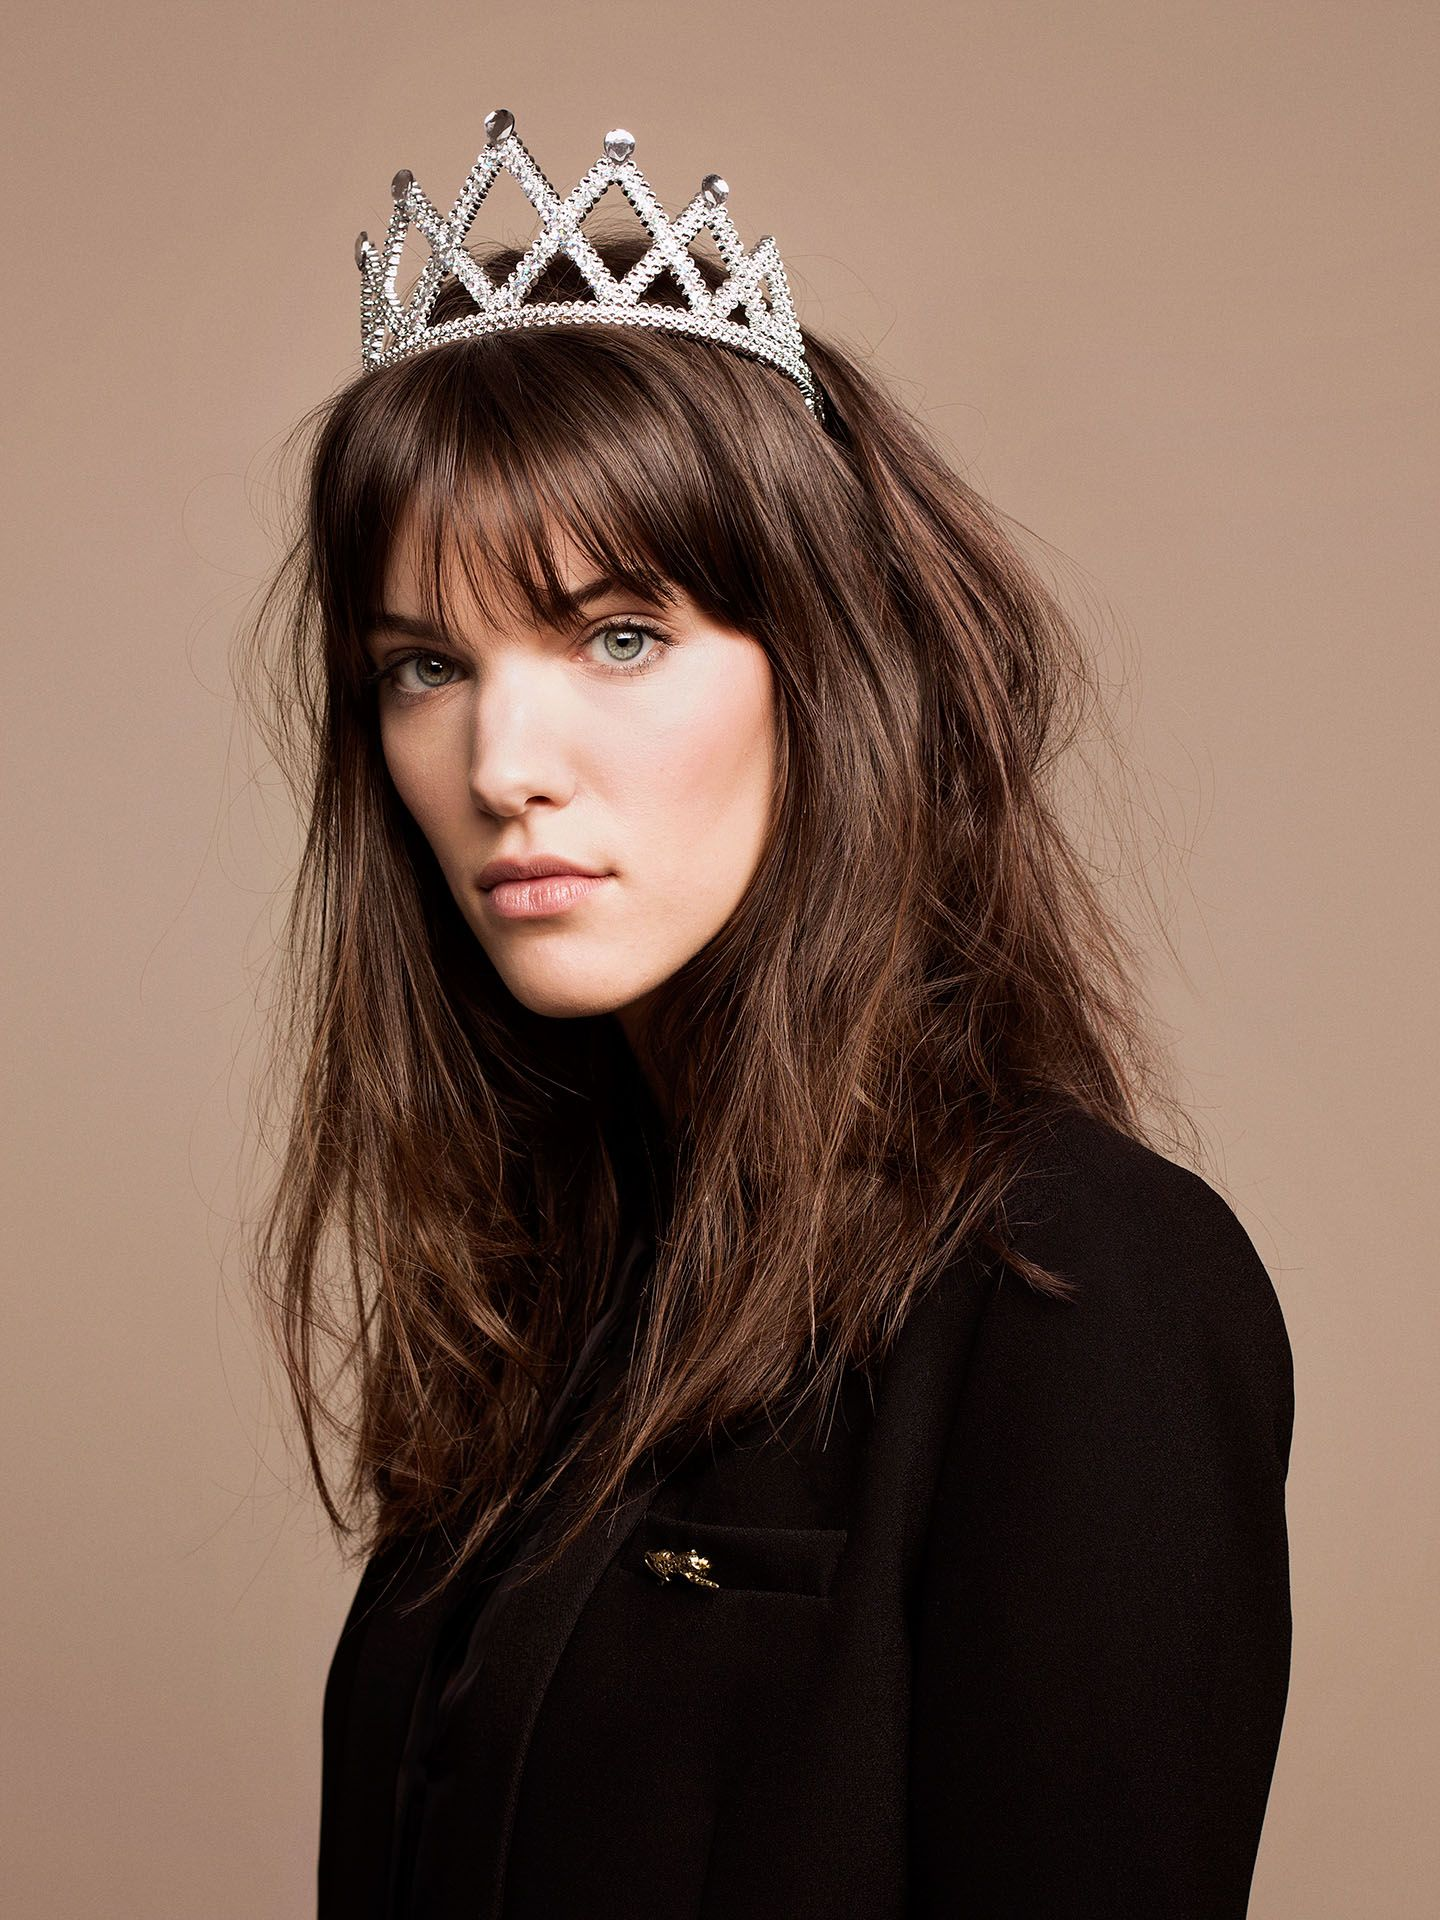 portrait of singer Charlotte Cardin looking at camera dressed in black turtleneck wearing plastic crown on beige background by Jocelyn Michel for Voir